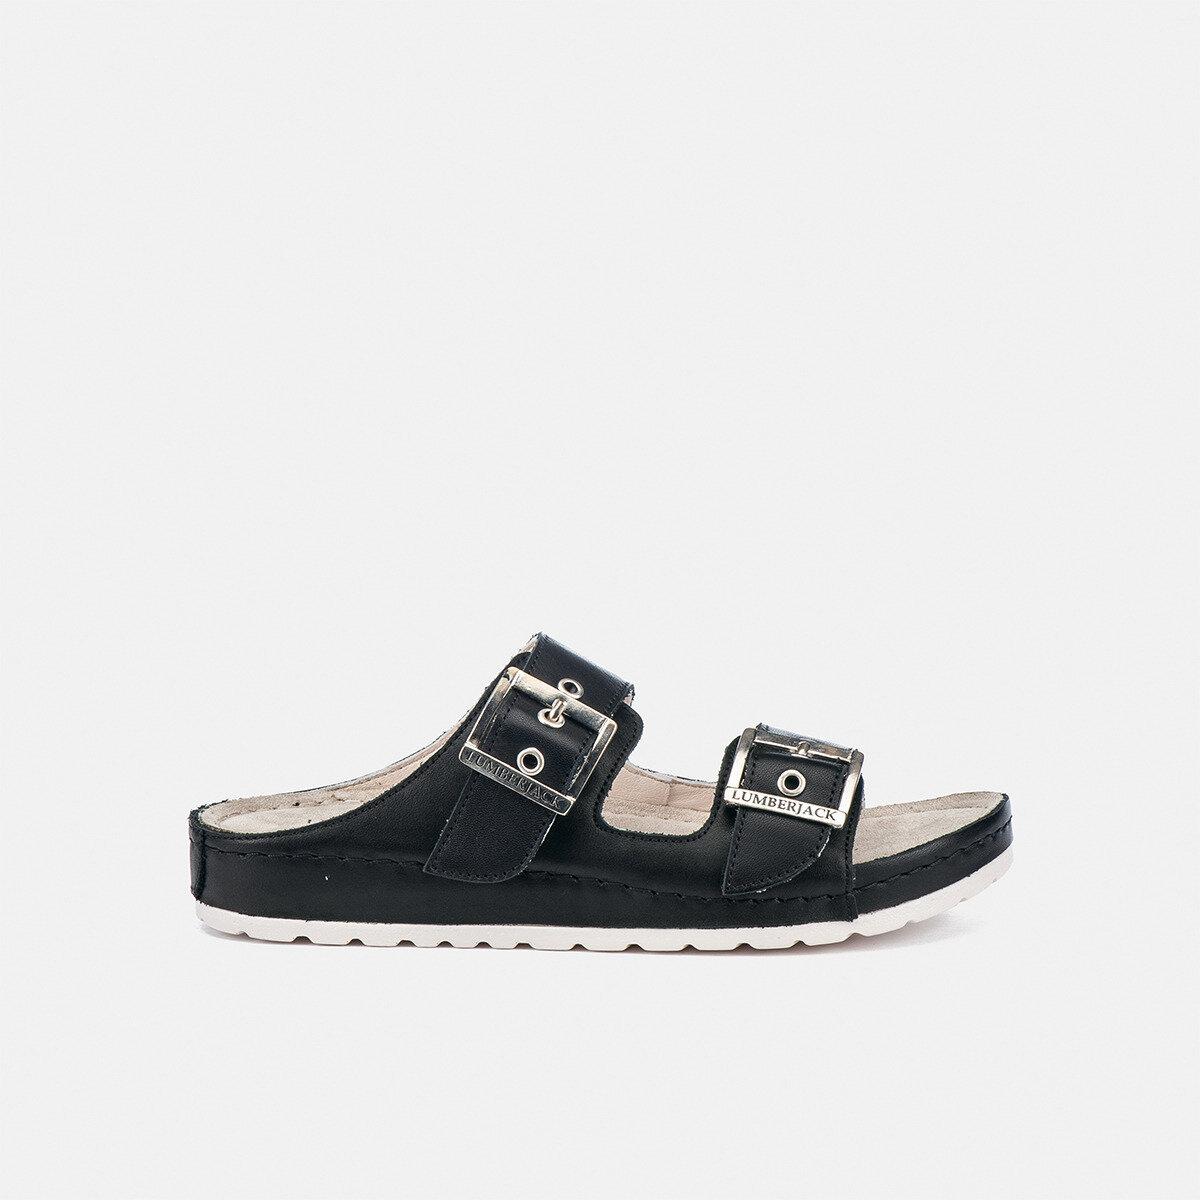 EZA BLACK Woman Sandals